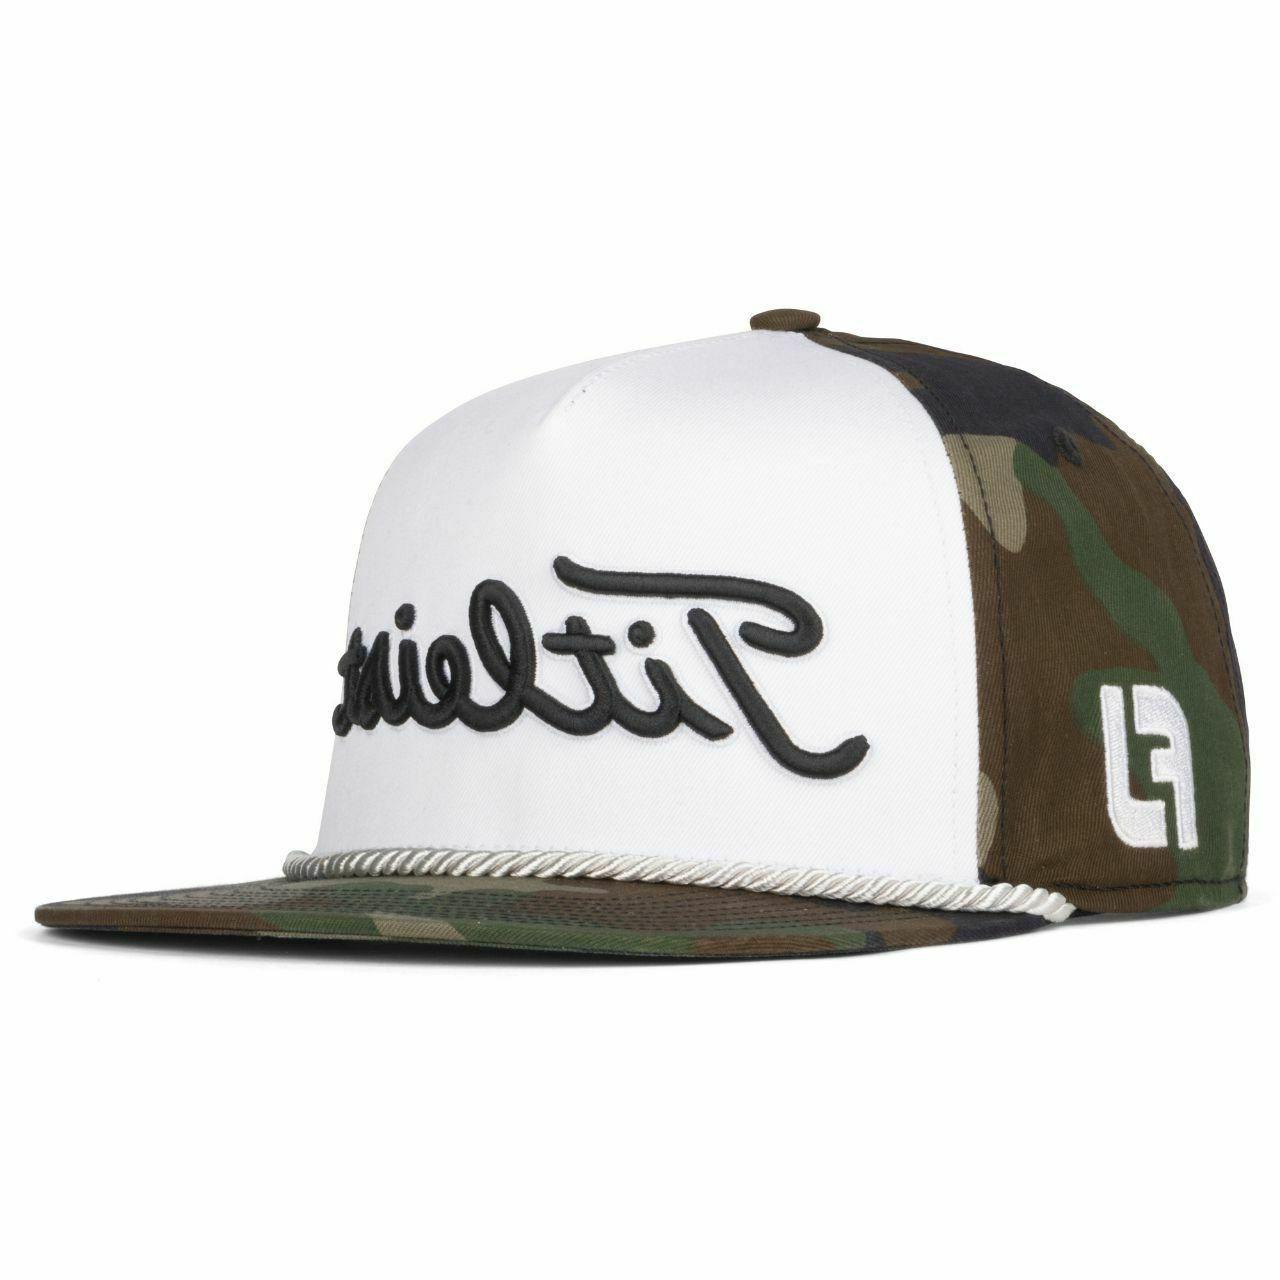 Rope hat/Cap Woodland Camo Edition